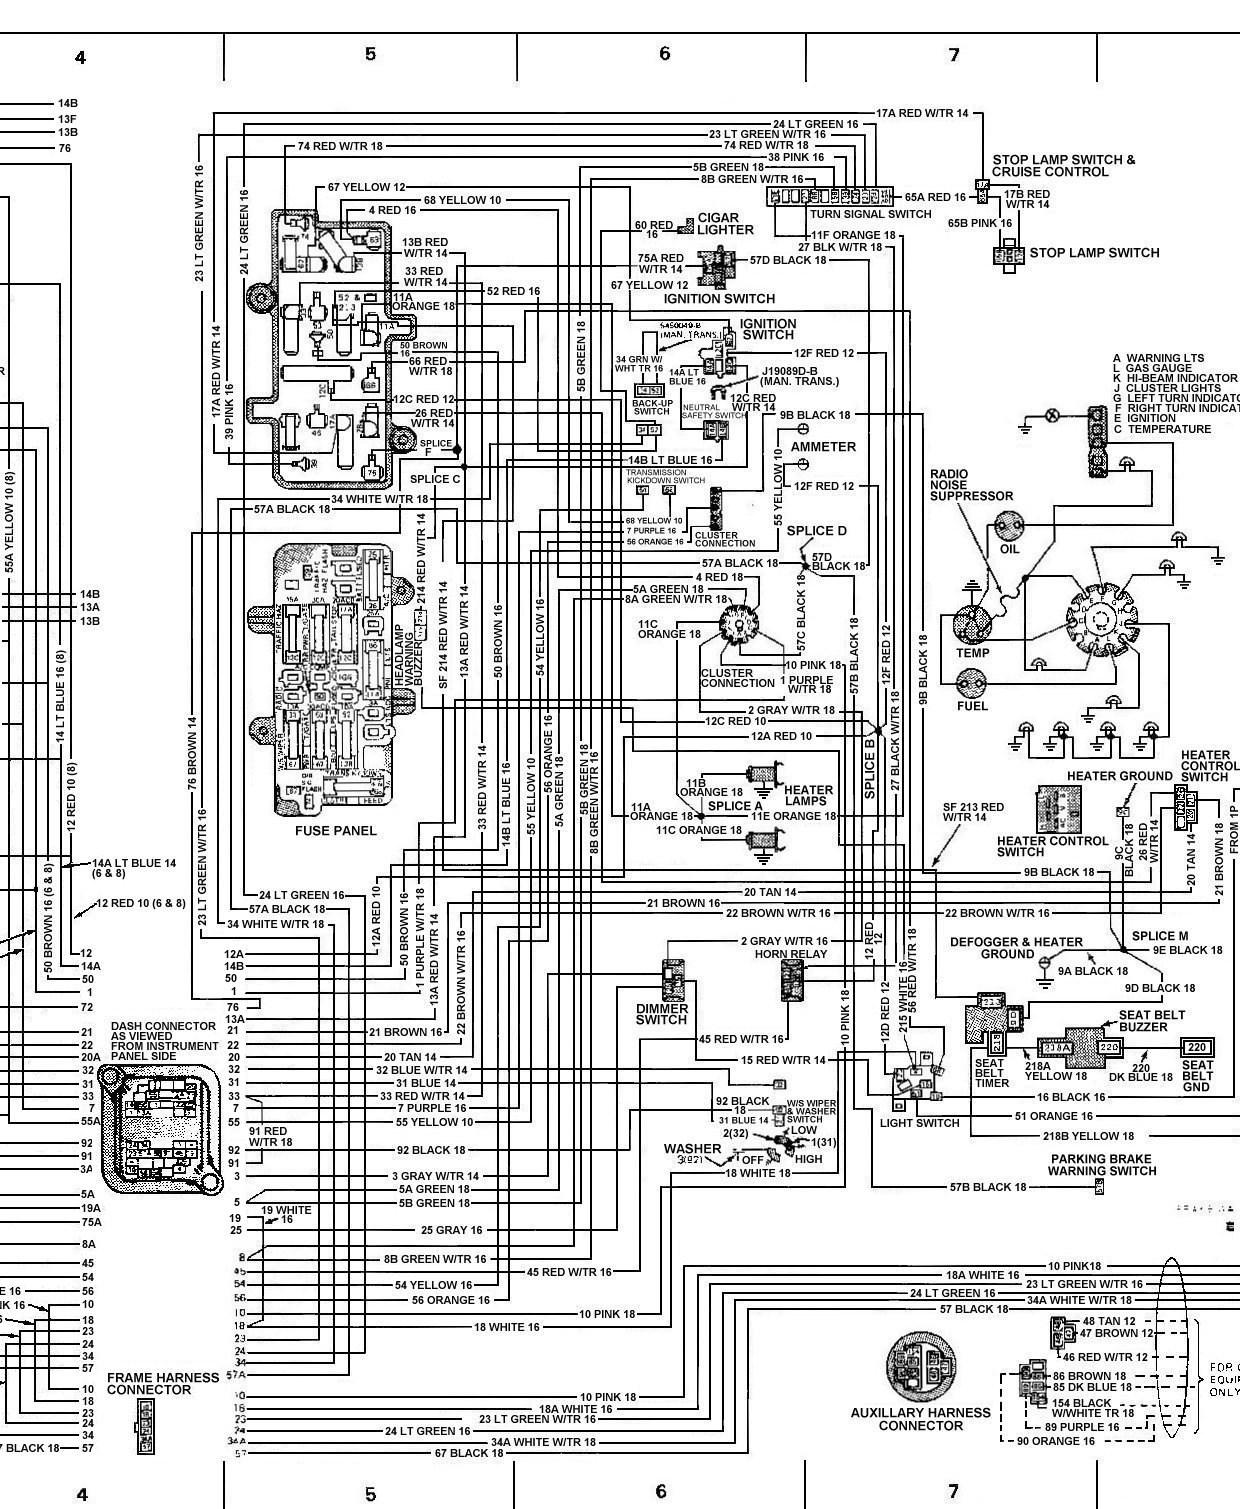 Wiring Diagram 2003 Jetta Magneto For Farmall C Wiring Diagram Surya Madfish It